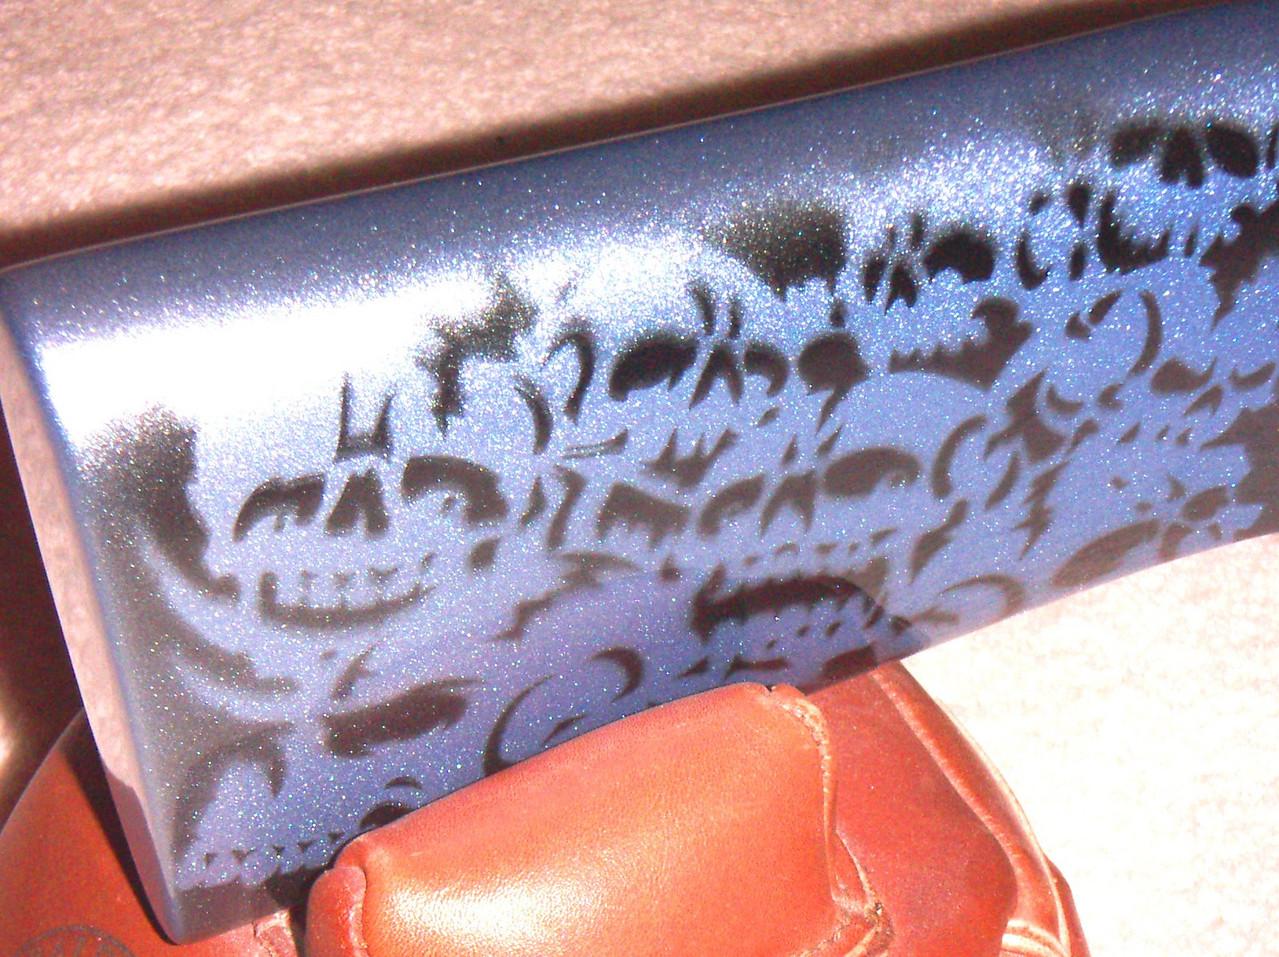 "LV RIFLE - STOLLE PANDA ACTION - KRIEGER BARREL - 6PPC SPEEDY GONZALES ""SPIDER WEB'ED"" BARREL"